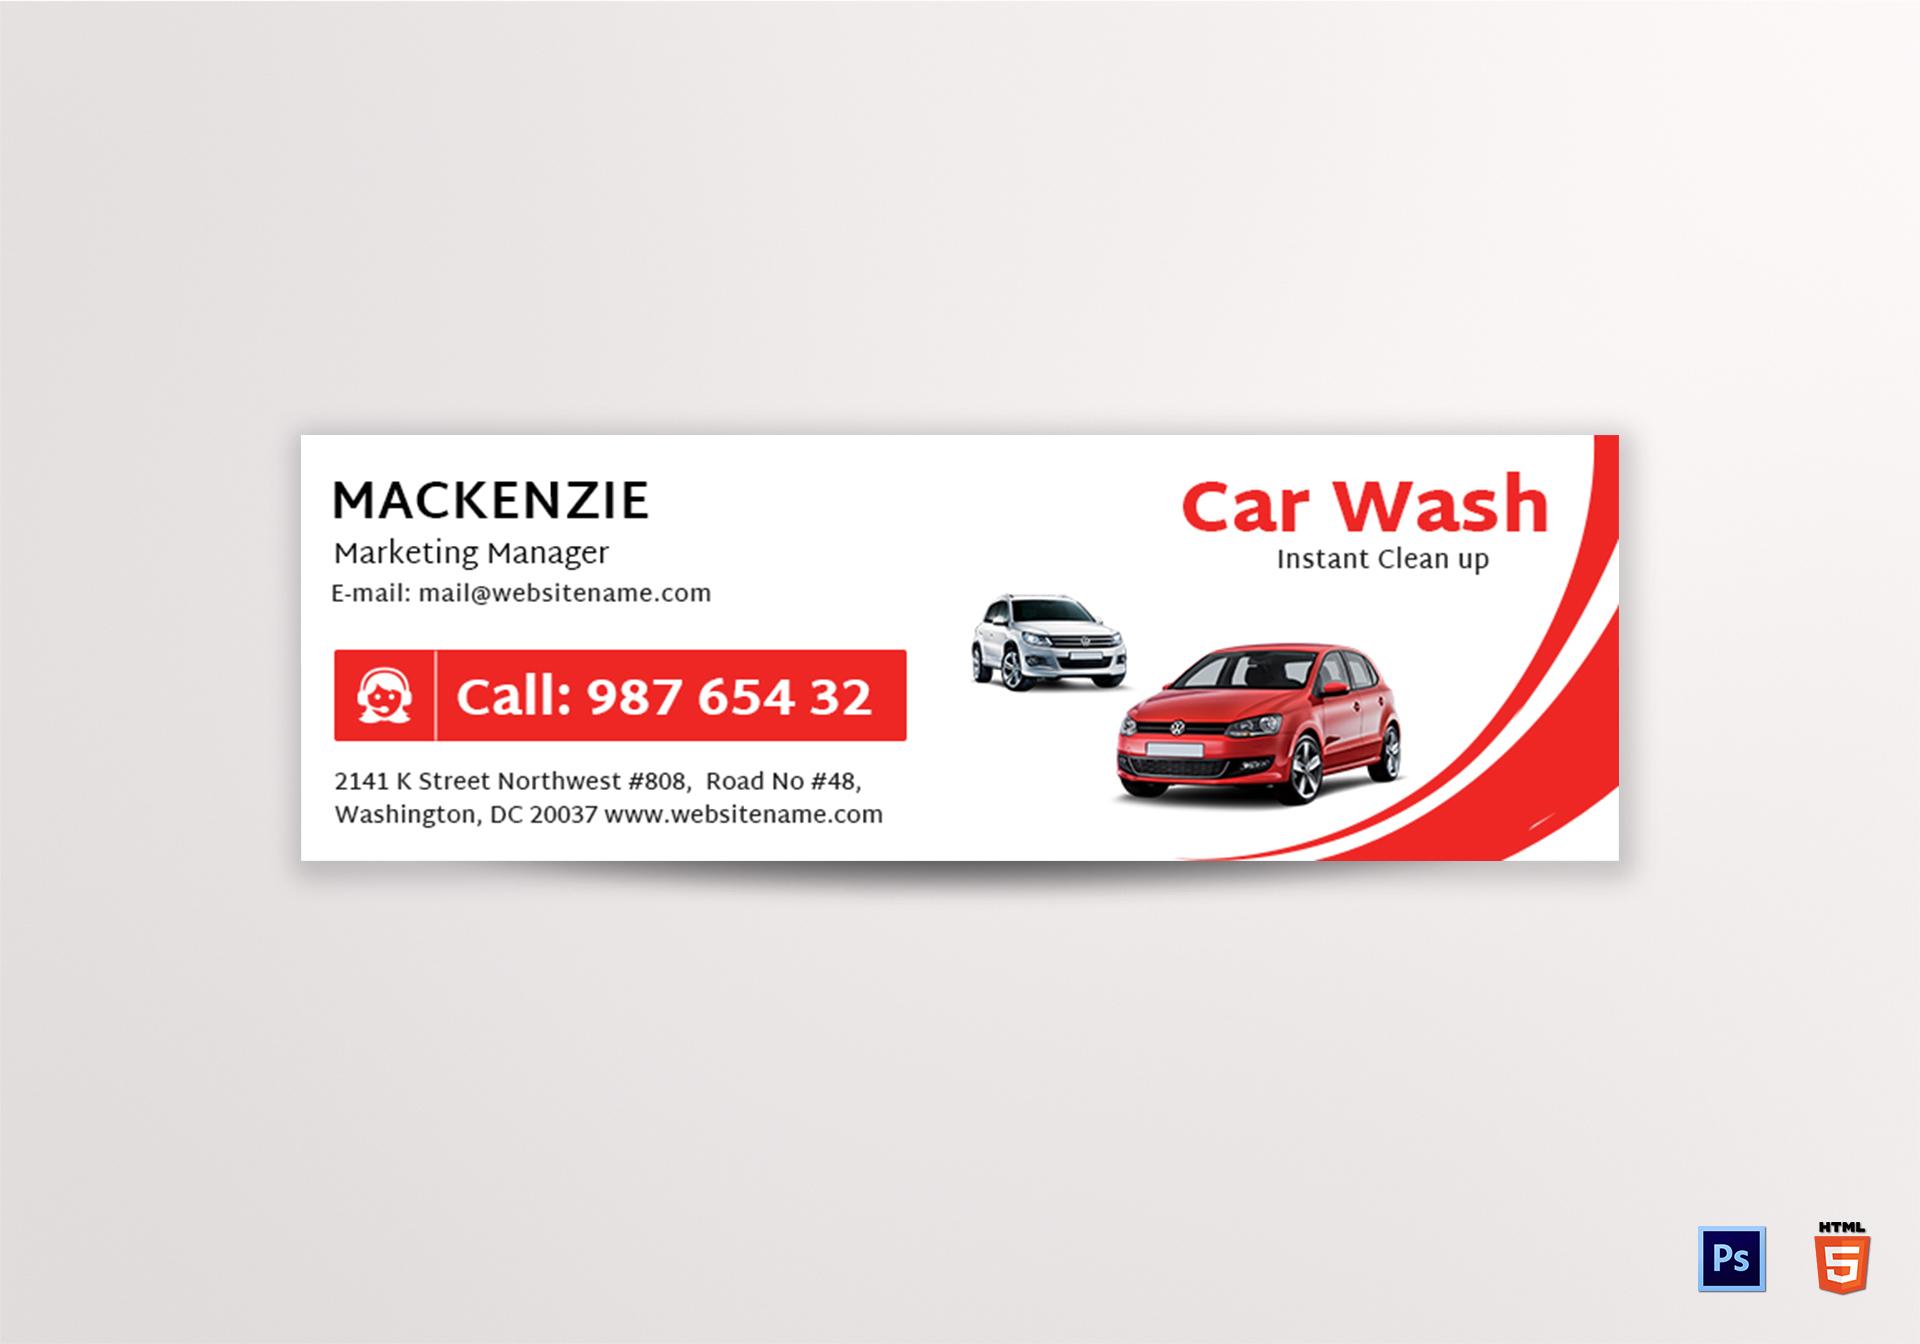 Car Wash Email Signature